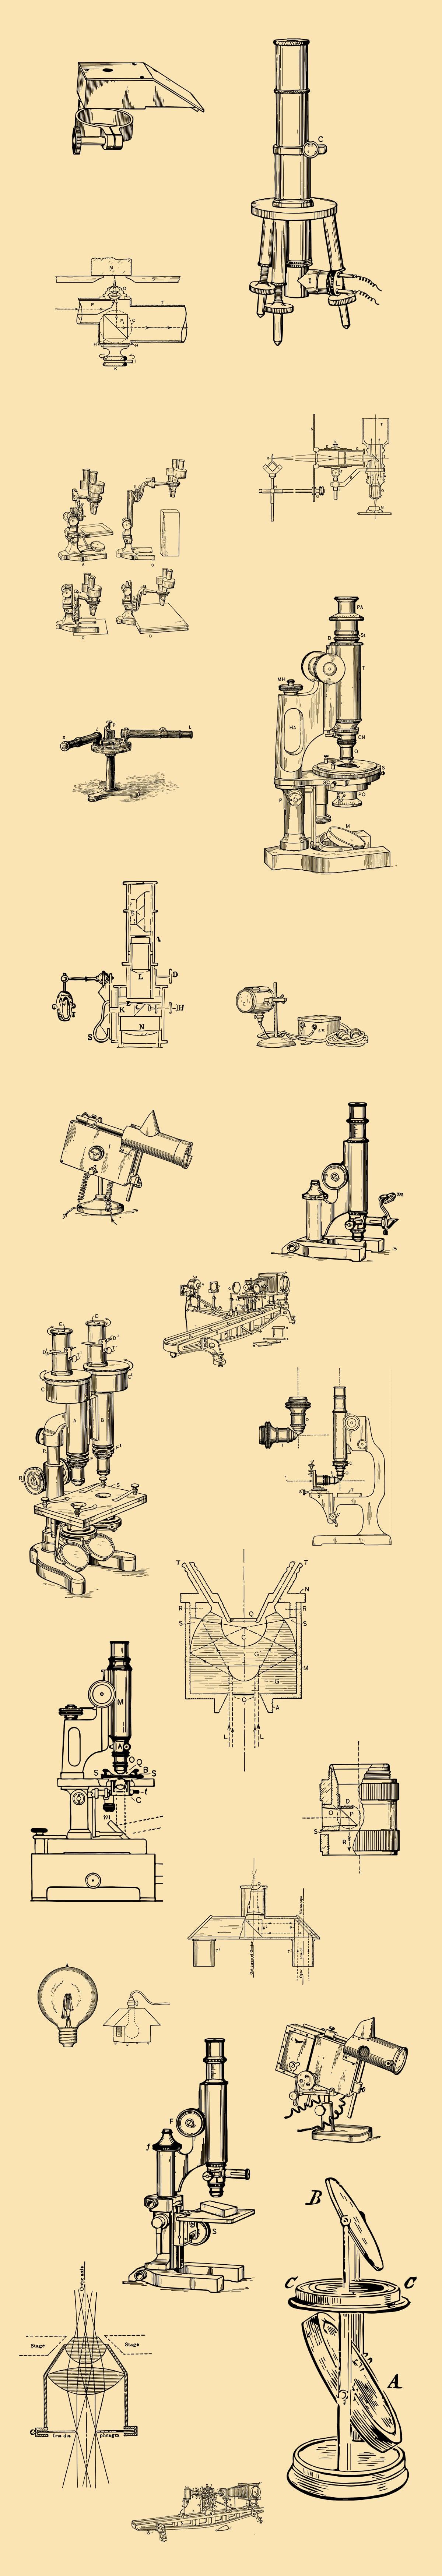 Vintage Optical Devices Illustrations